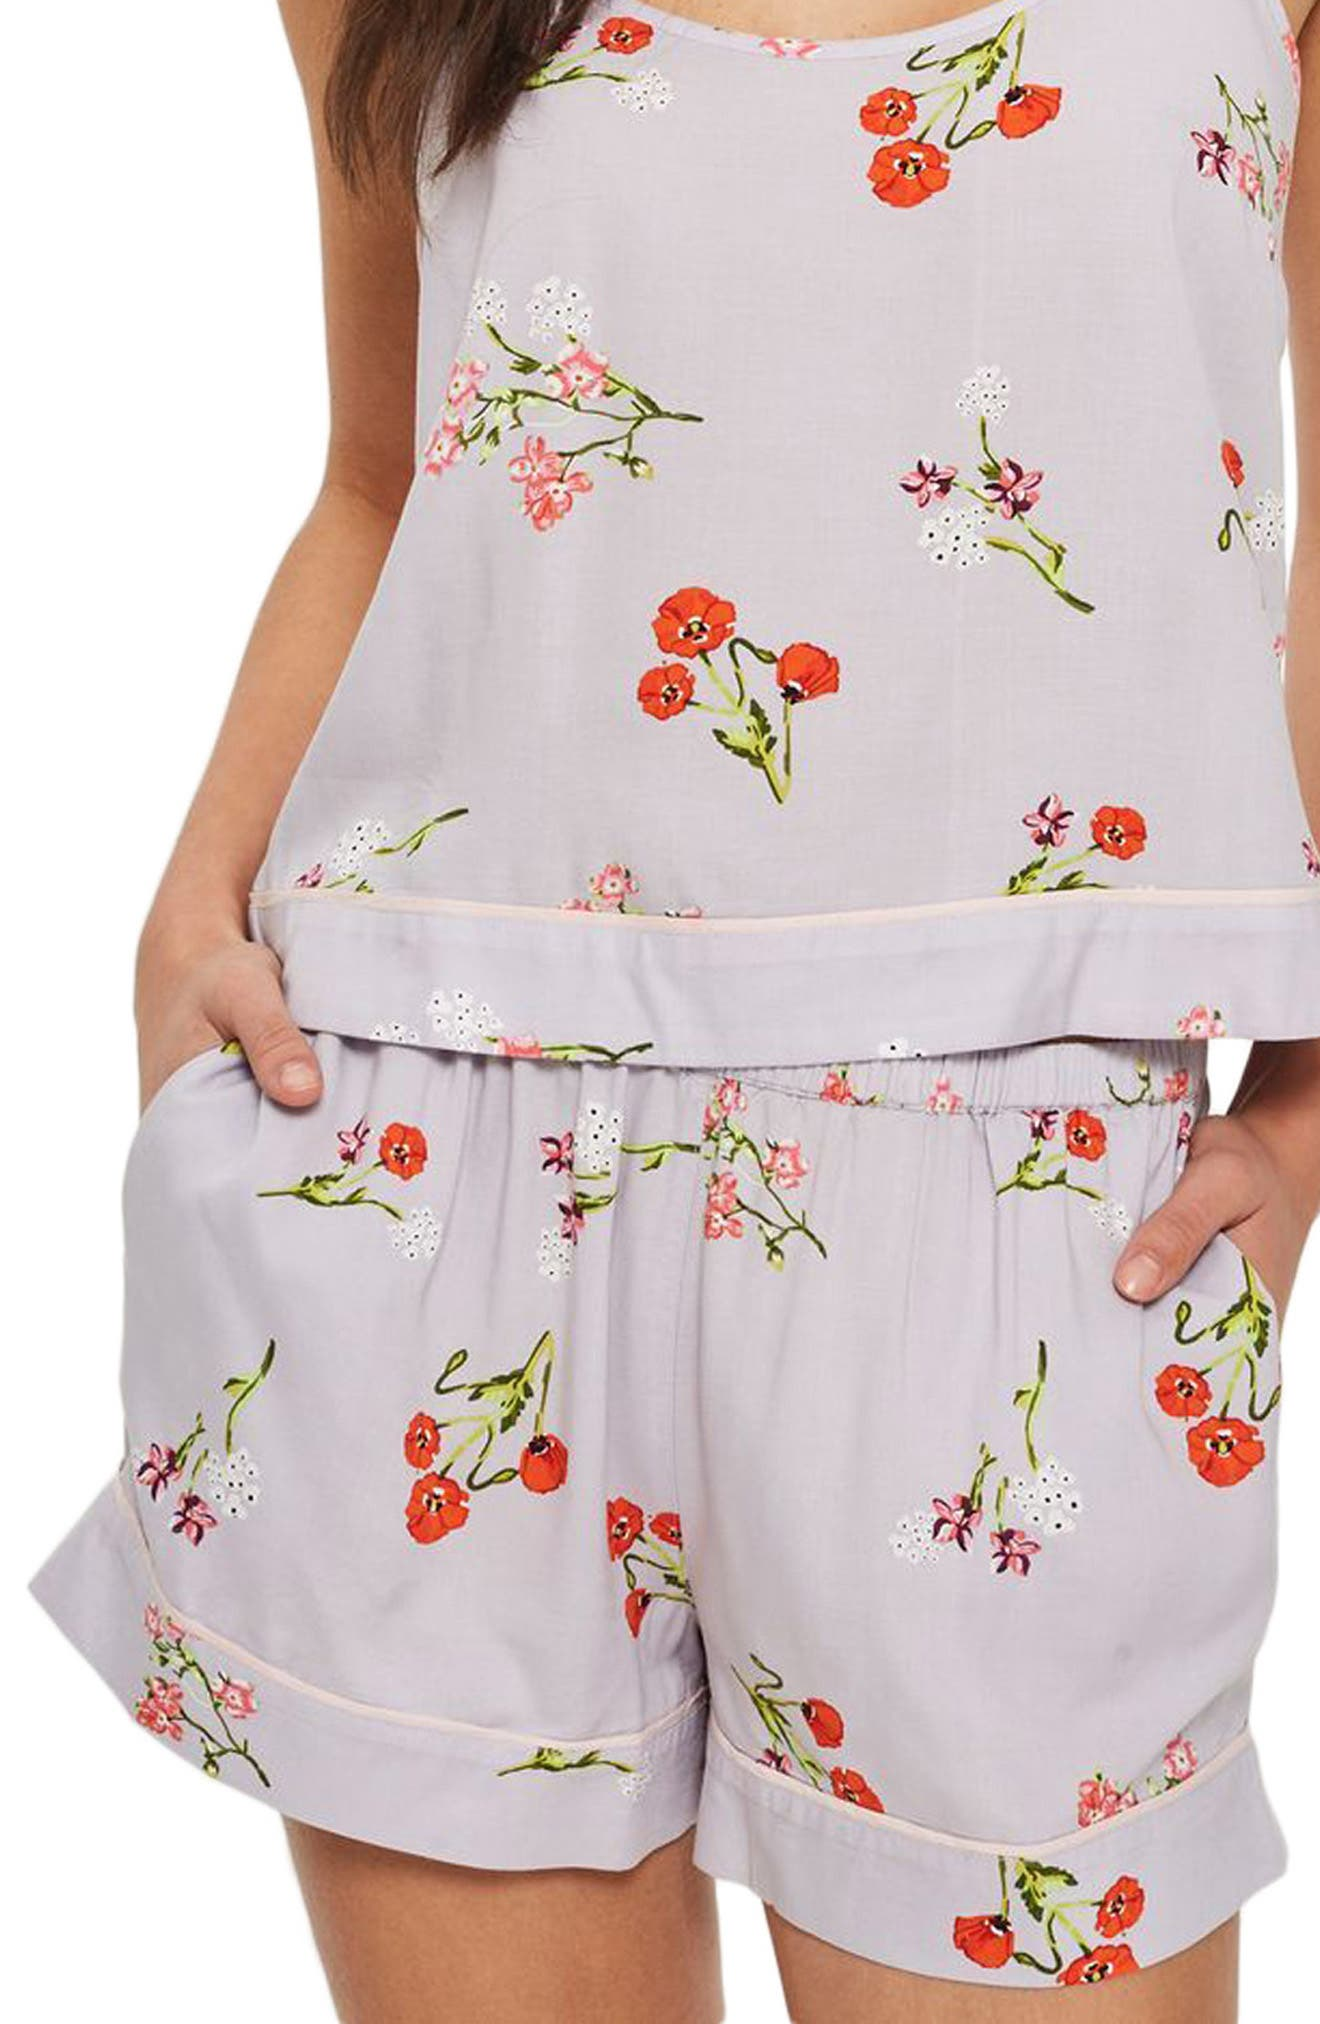 Topshop Poppy Pajama Shorts